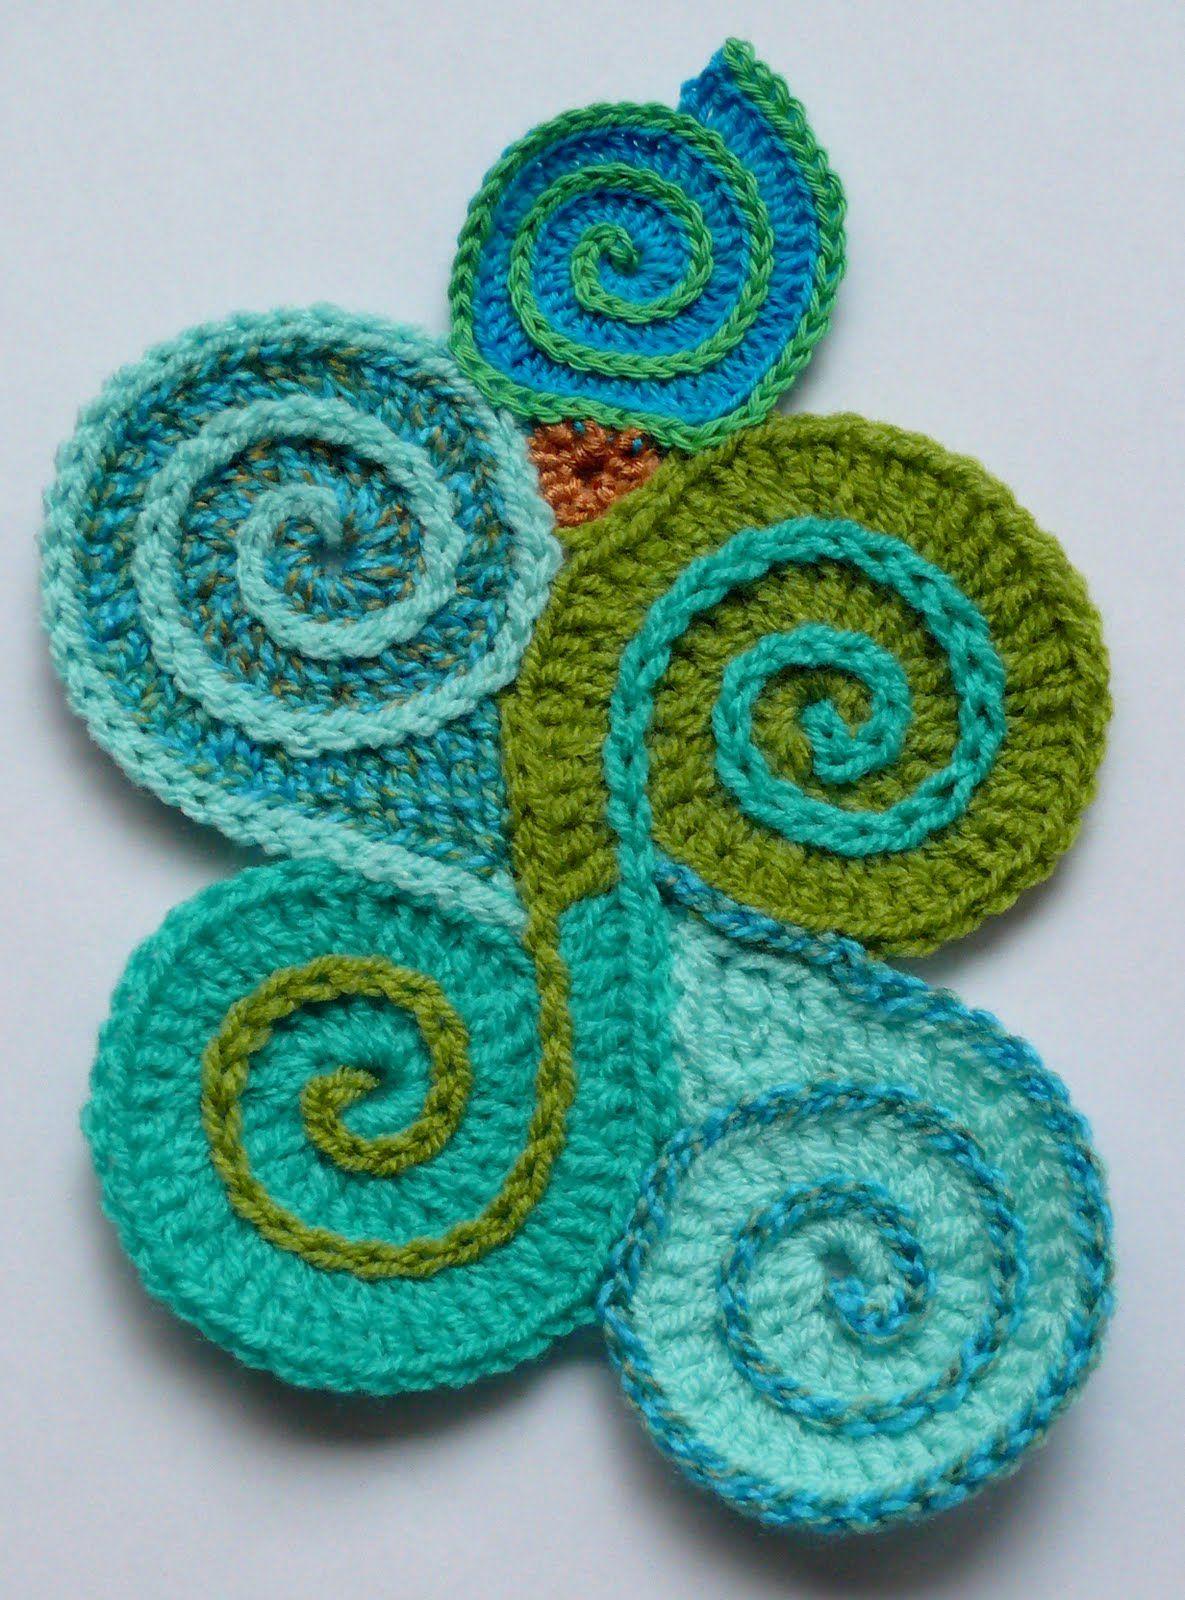 scrumble - Google Search | Crochet Scrumble | Pinterest | Super ...